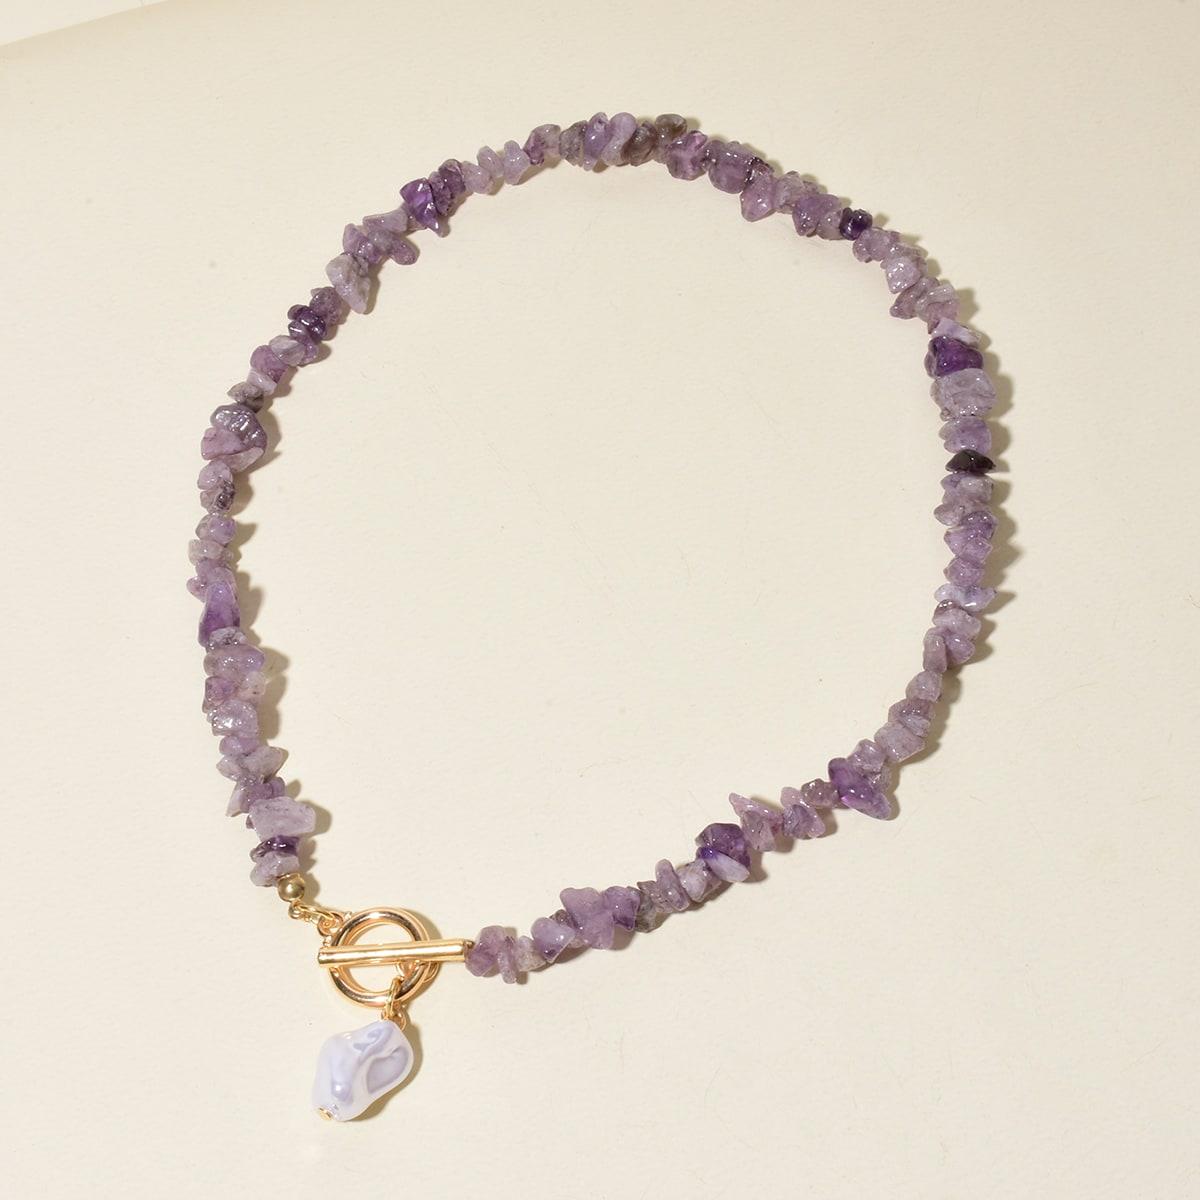 Faux Pearl Pendant Stone Necklace